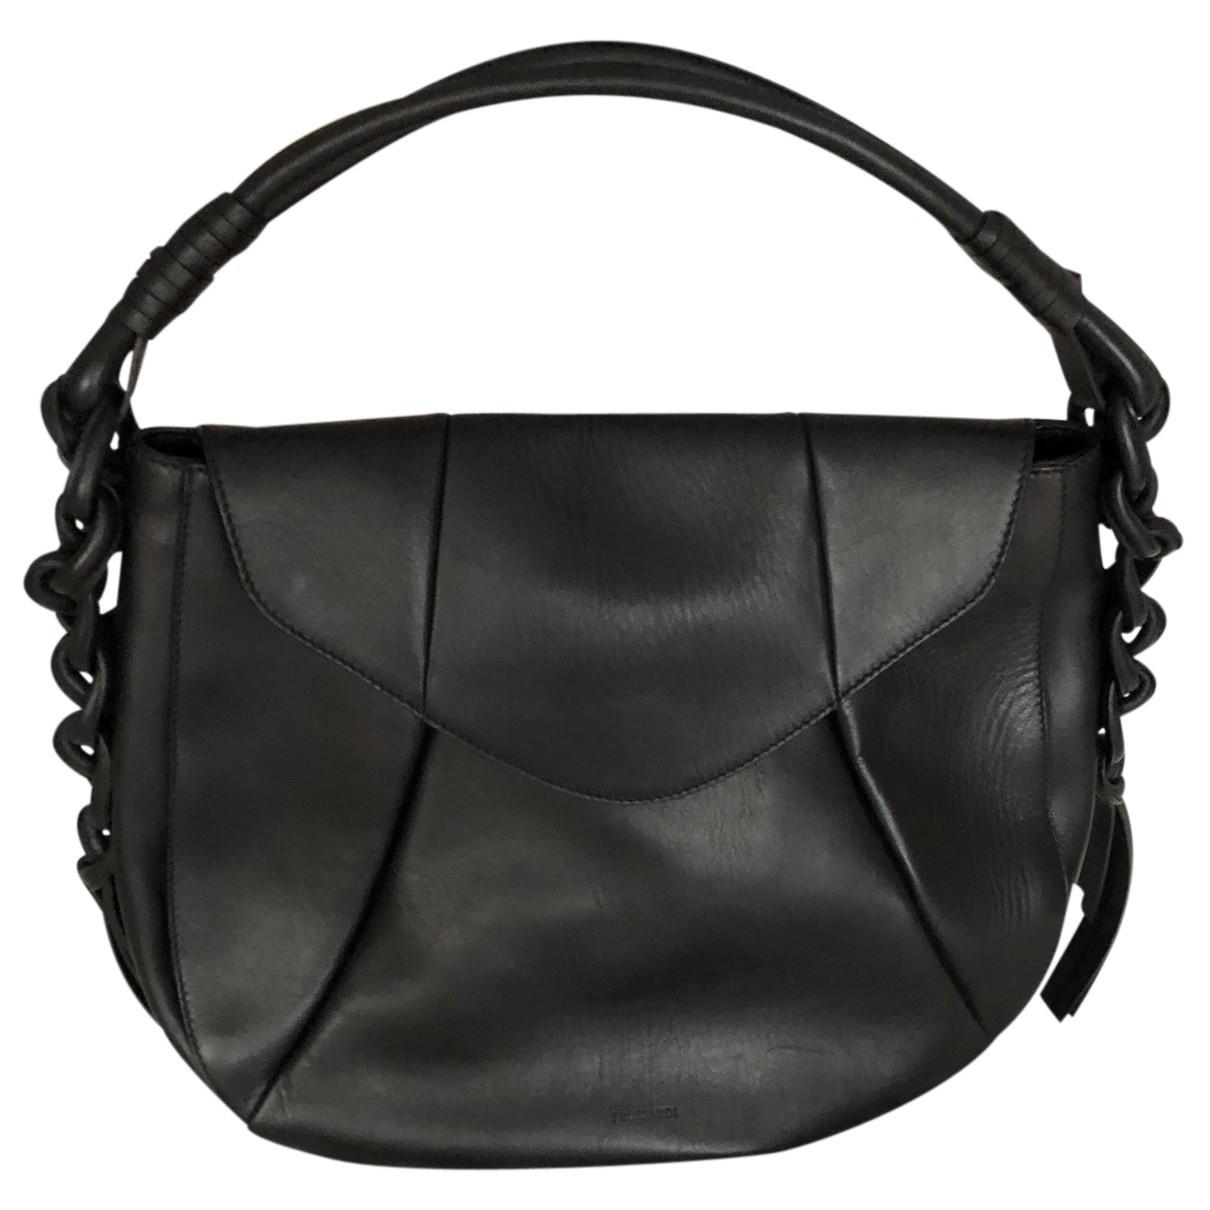 Trussardi N Black Leather handbag for Women N